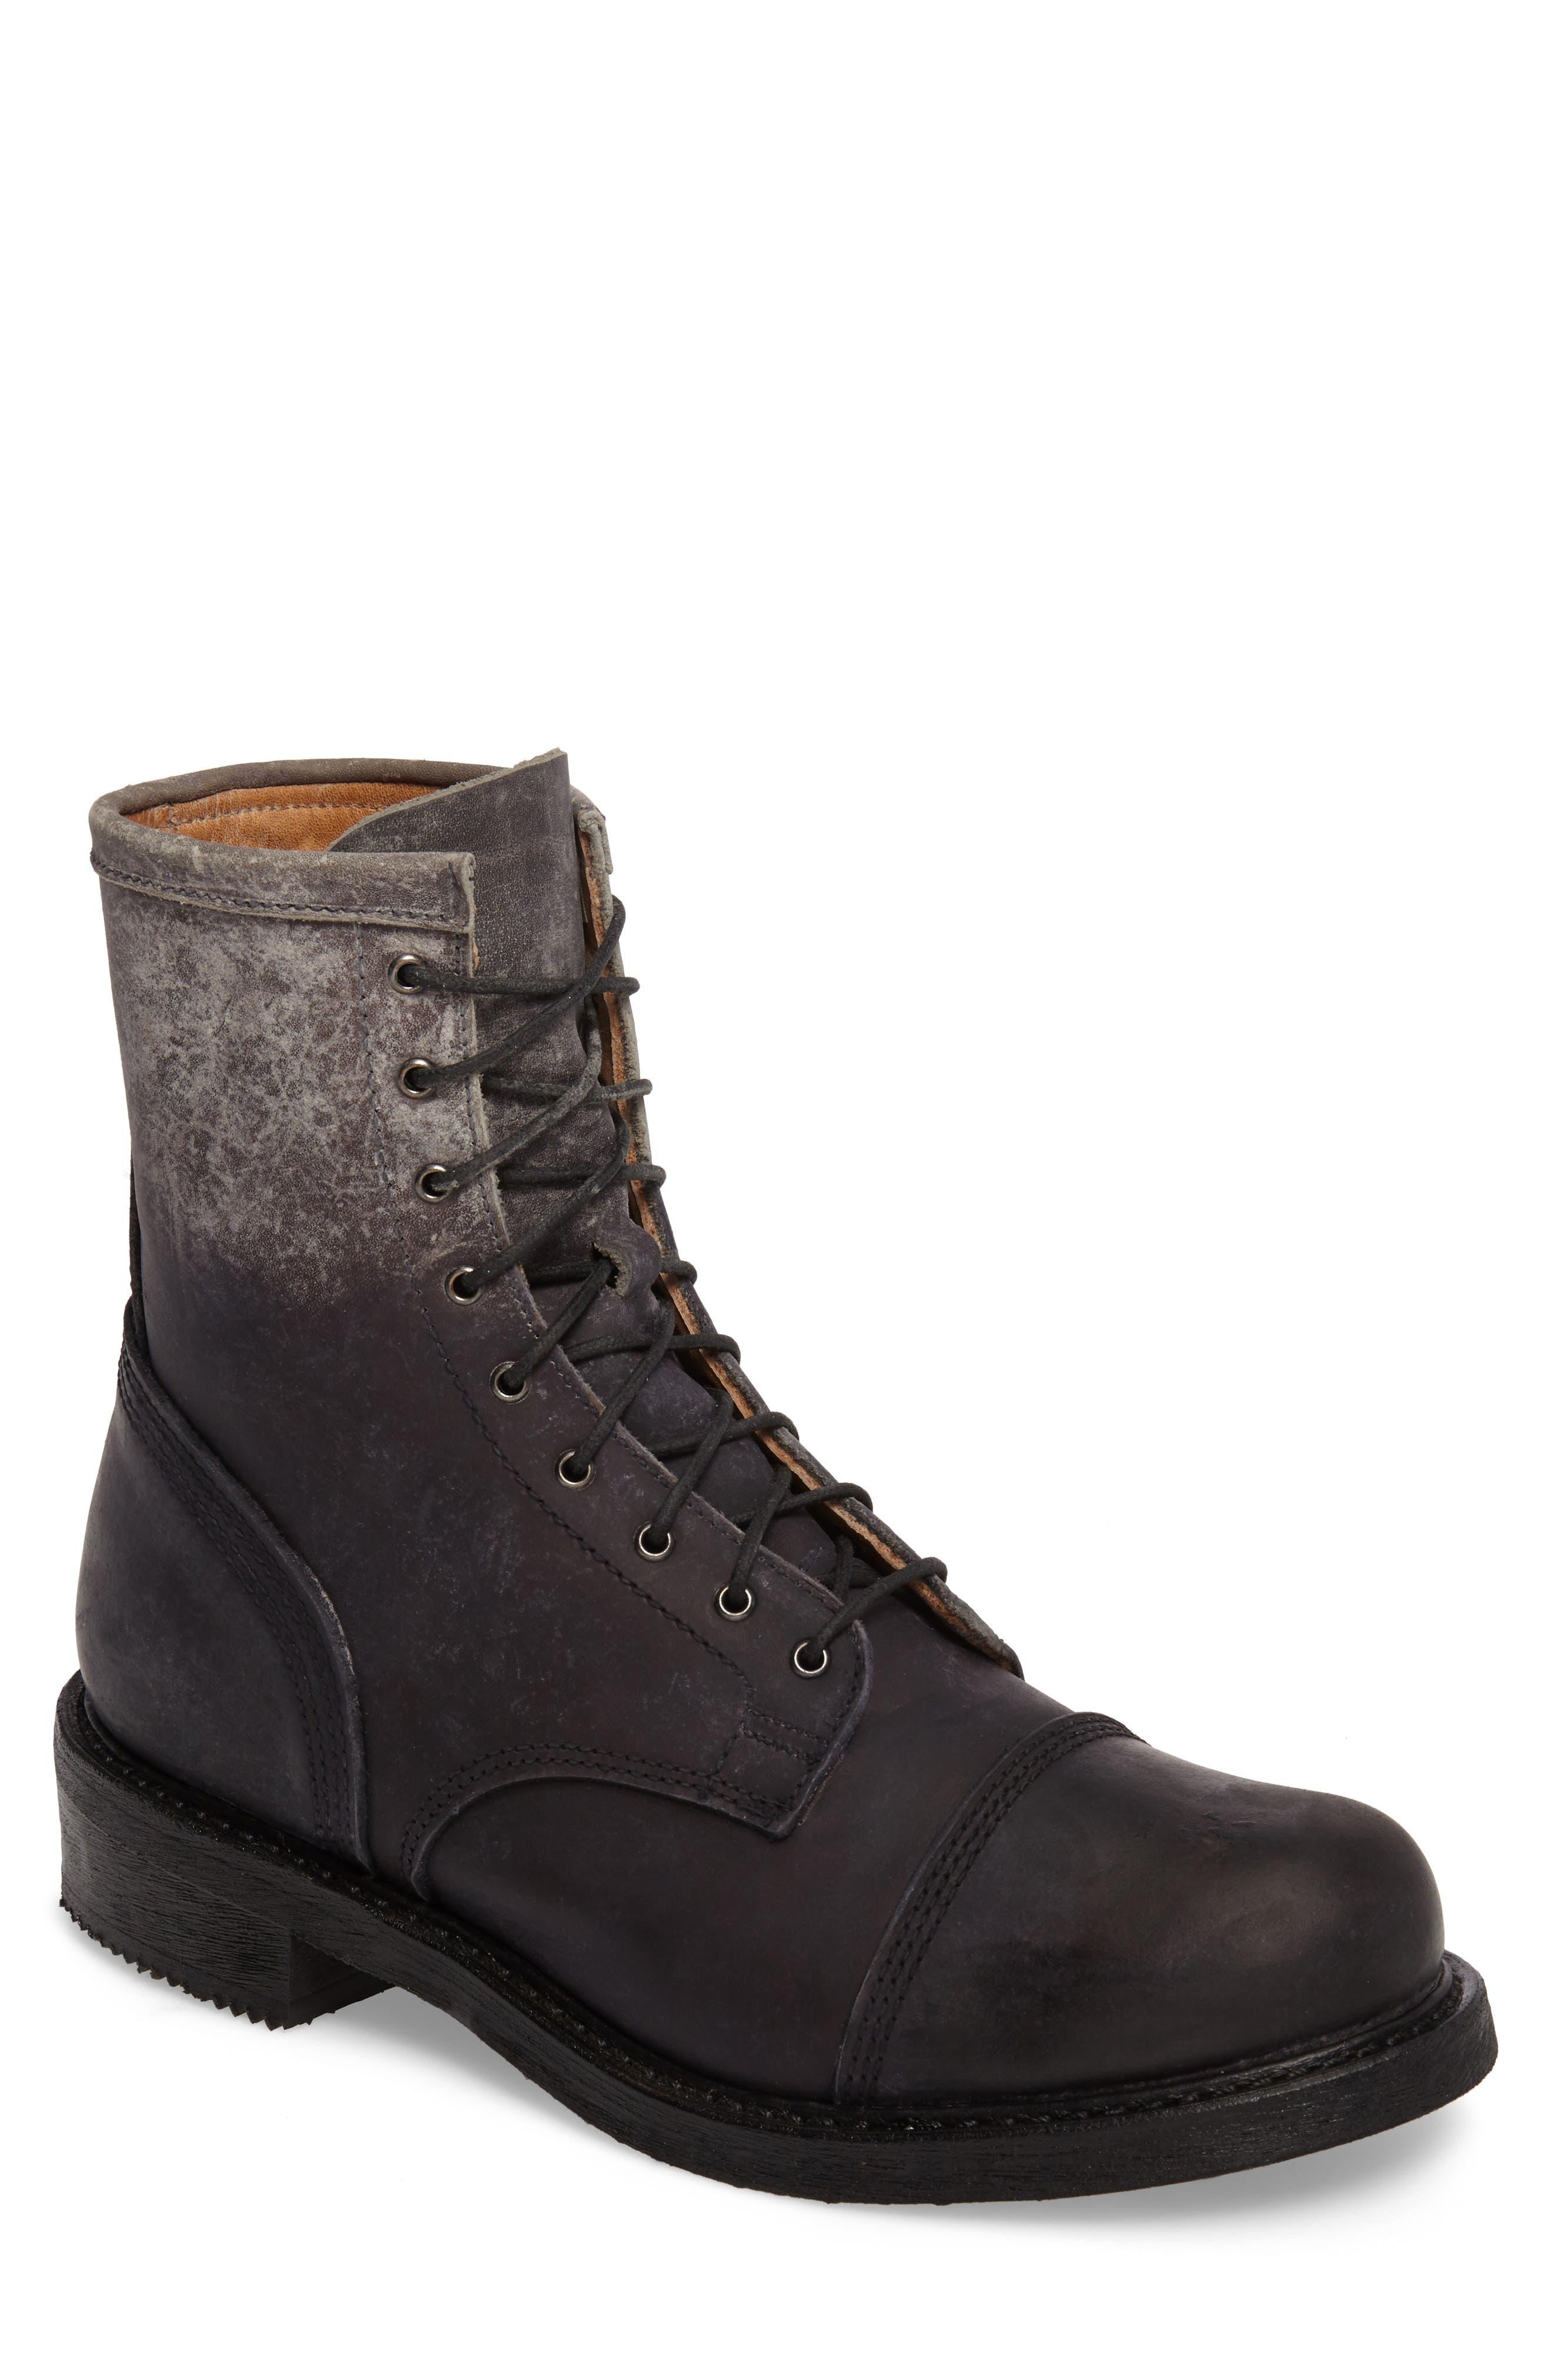 Alternate Image 1 Selected - Timberland Smuggler's Notch Cap Toe Boot (Men)